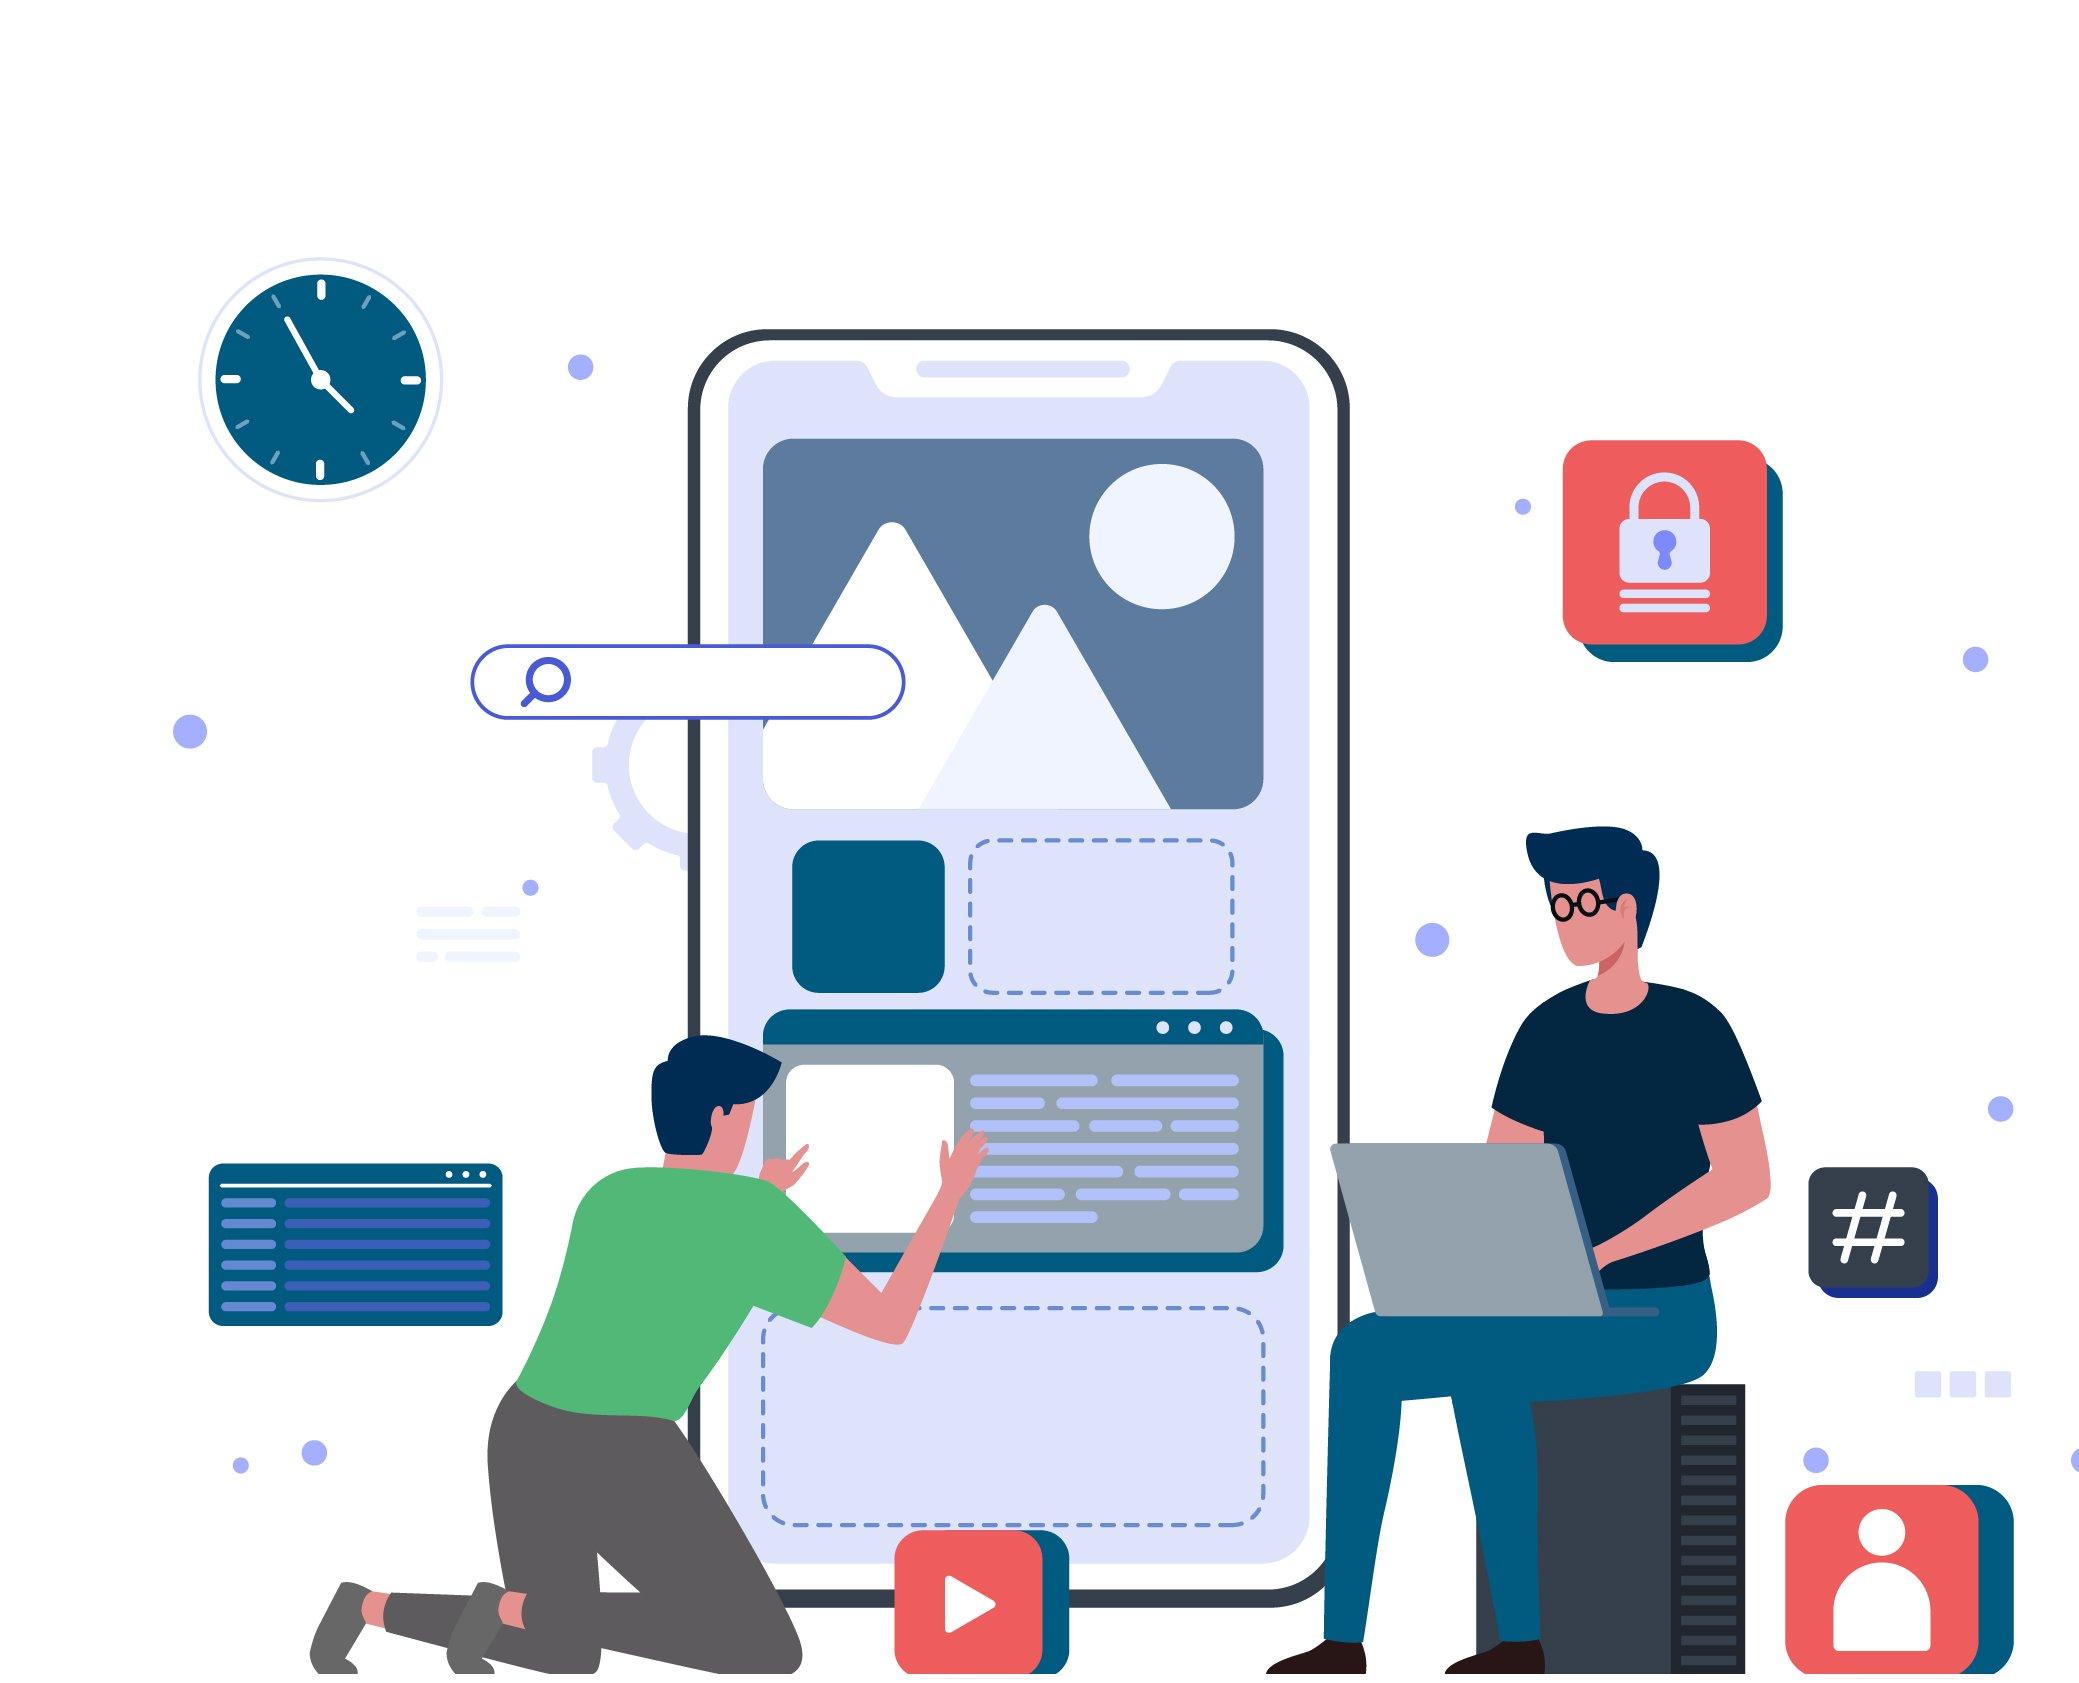 Aplusdigitalsolutions - Digital Marketing Company | Mobile App Development